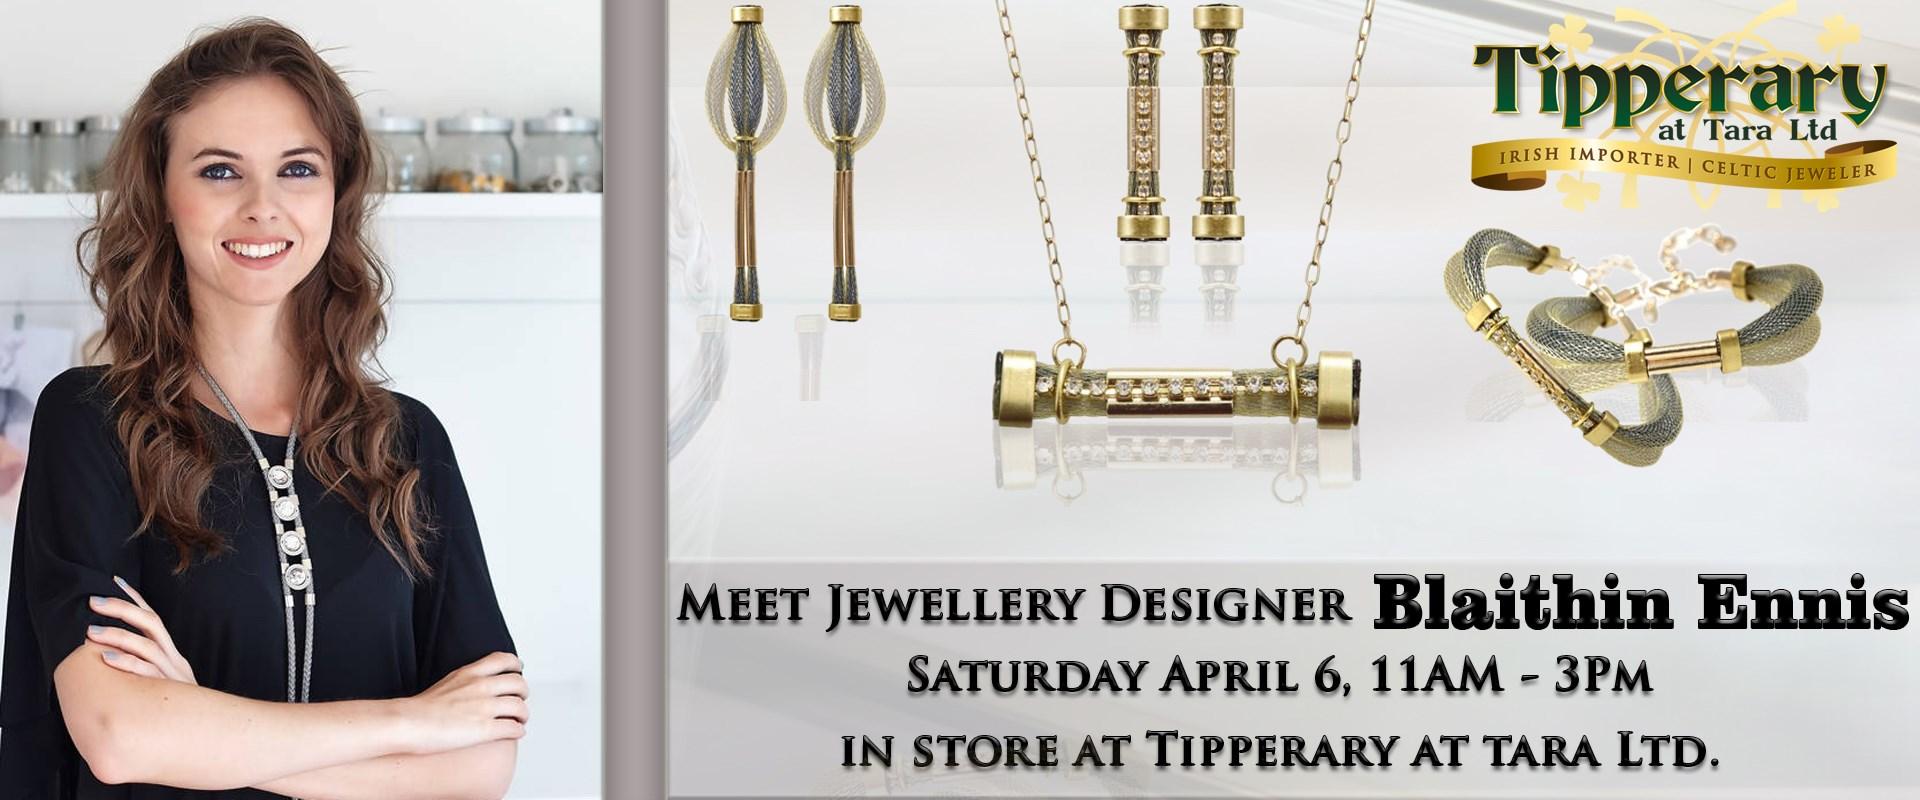 Meet Jewellery Designer - Blaithin Ennis